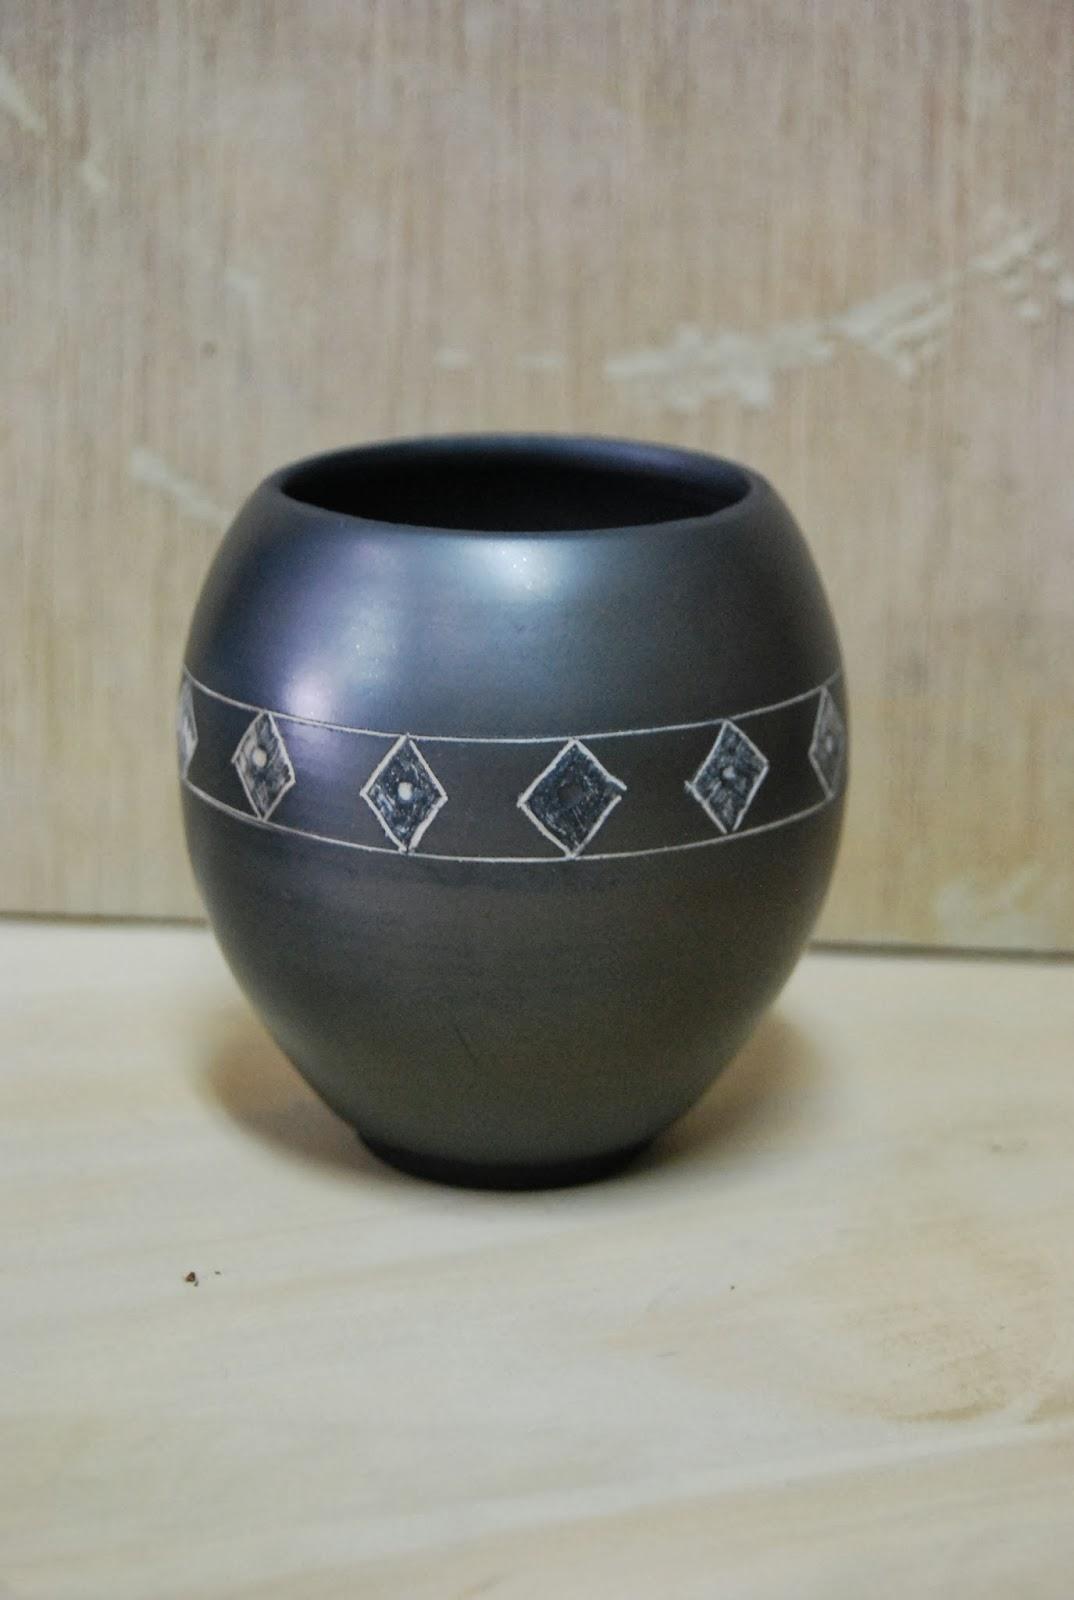 Kypsela fotos de piezas de cursos de cer mica negra - Fotos de ceramica ...